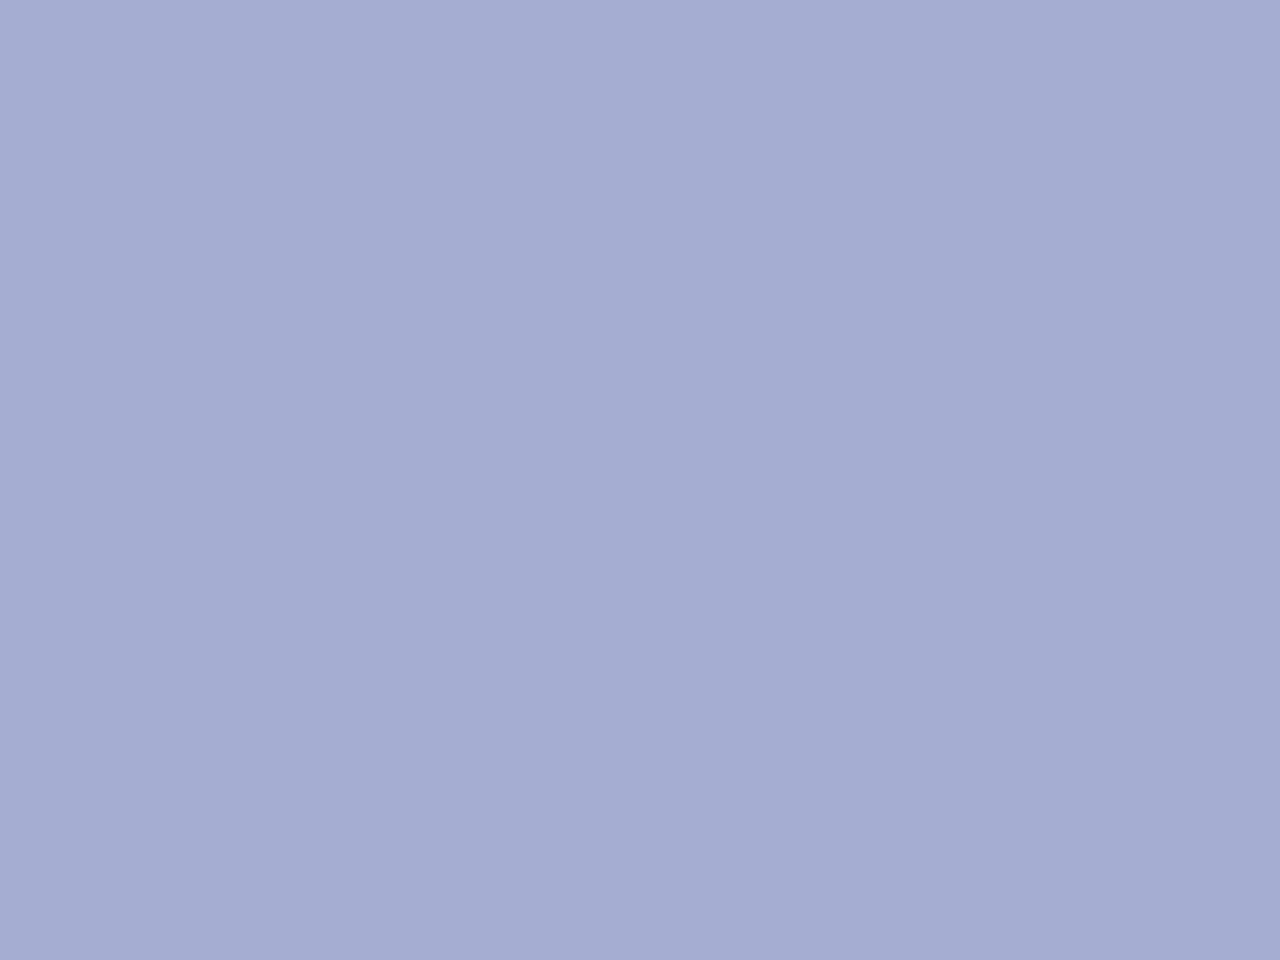 1280x960 Wild Blue Yonder Solid Color Background